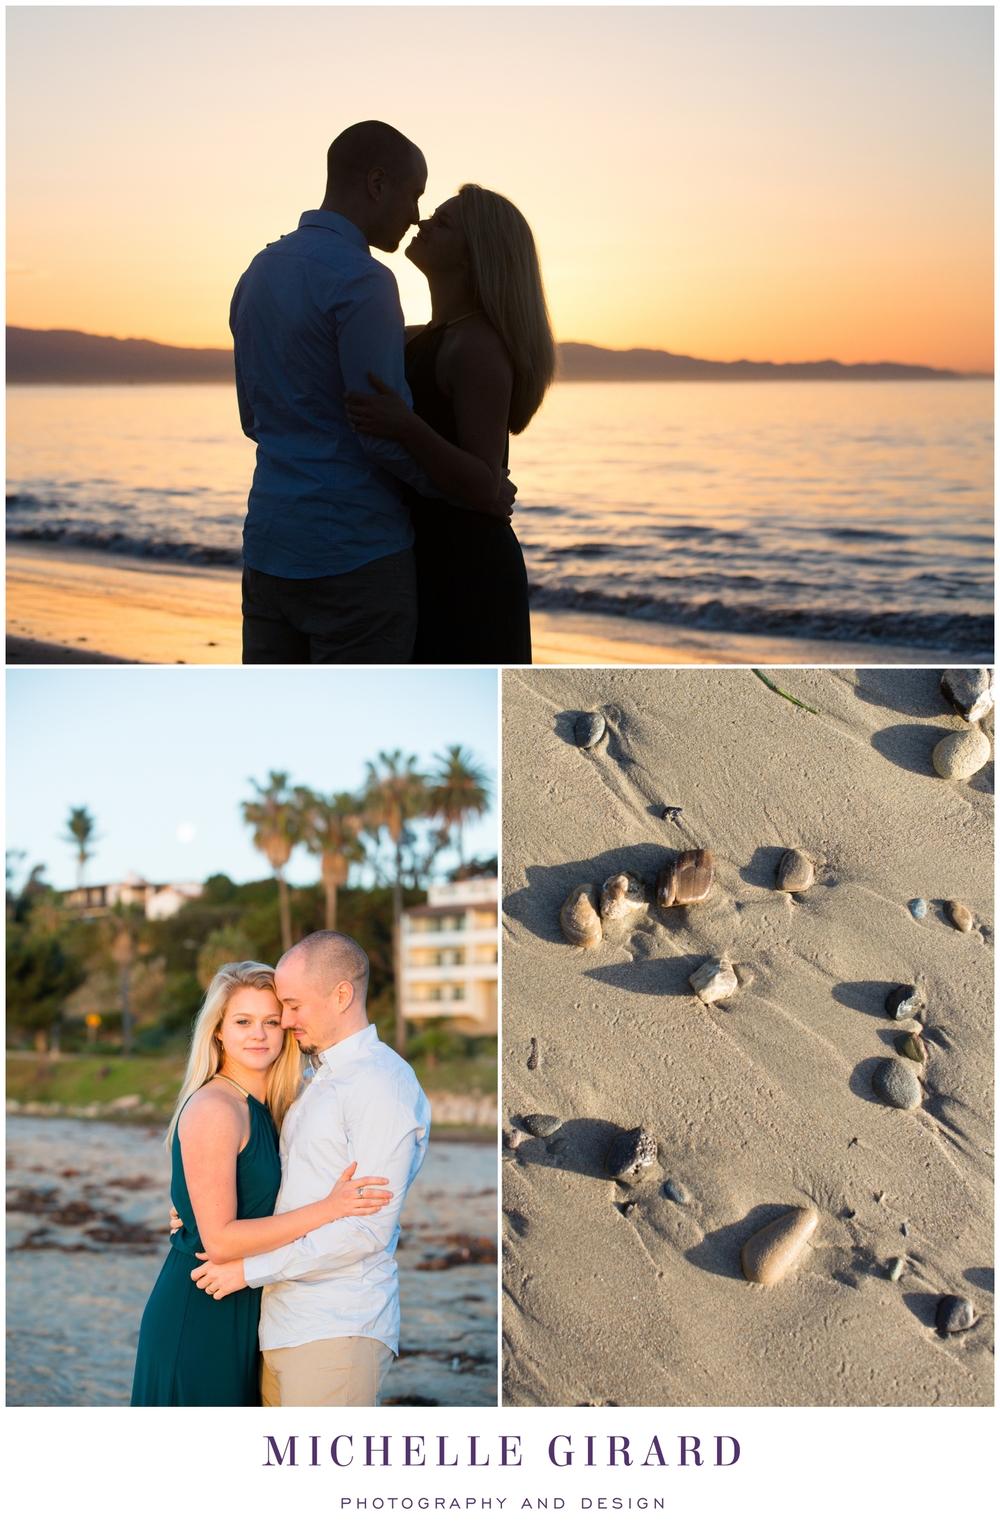 santa-barbara-california-engagement-photography-sunrise-theater-beach-michelle-girard02.jpg